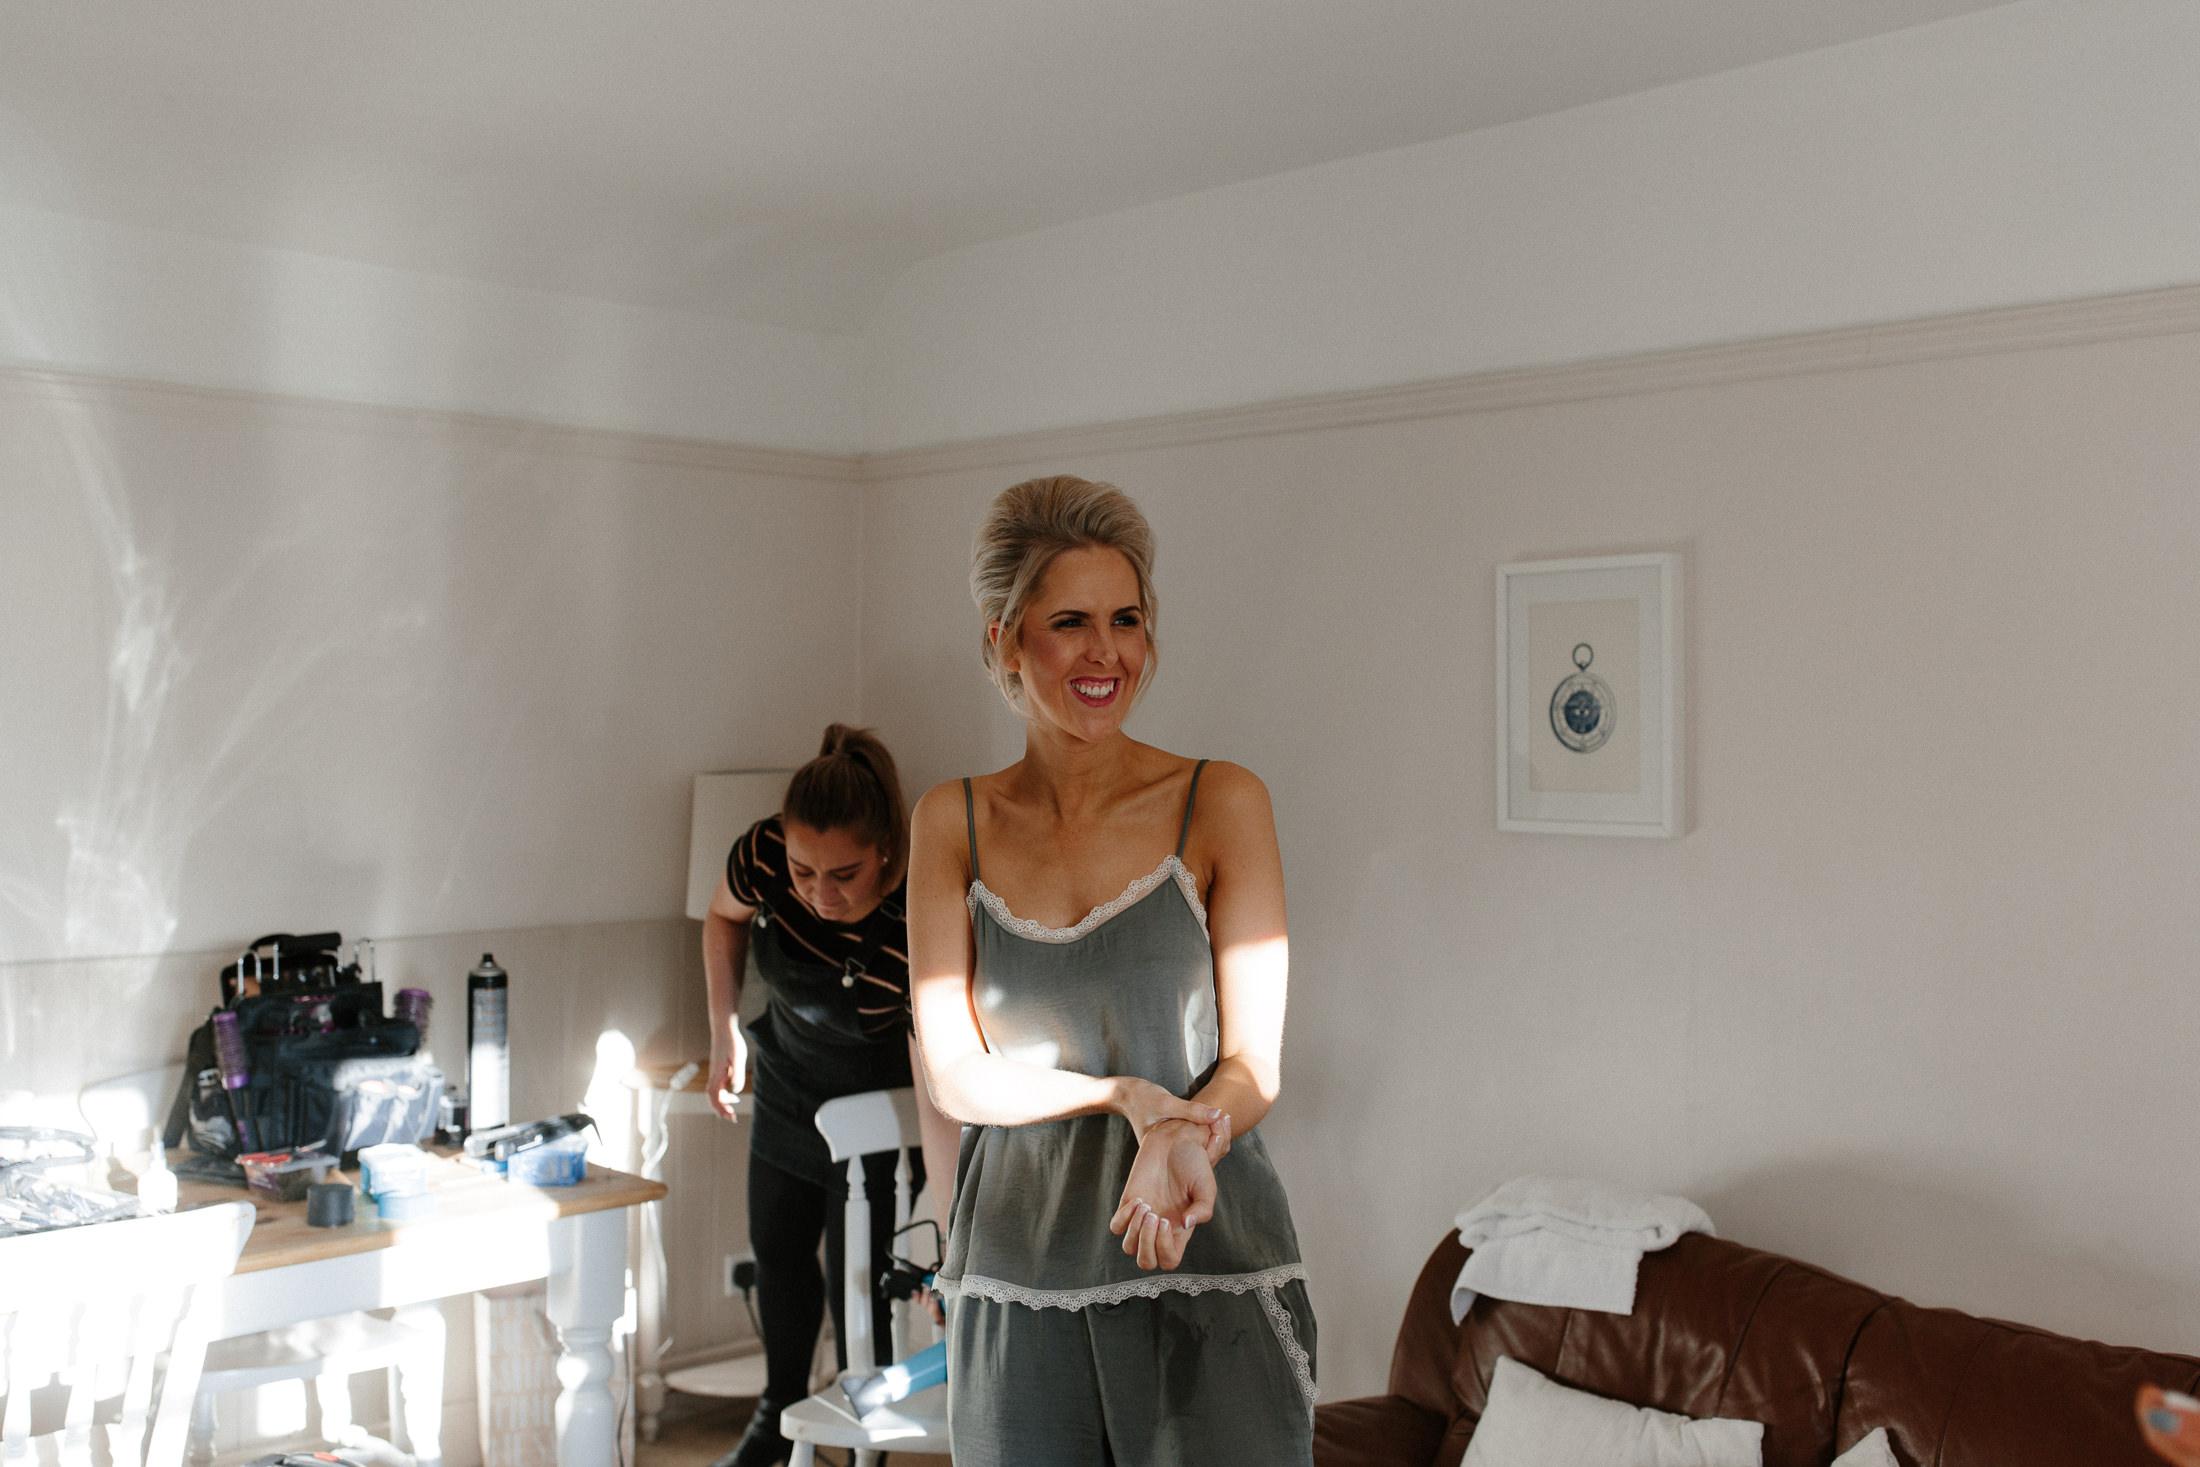 Kayleigh-Michael-Cow-Shed-Cowshed-Crail-Fife-Coastal-Rustic-Barn-Lianne-Mackay-Wedding-Photography-Photographer-Edinburgh-Glasgow-Scotland-WEB-RES-125.jpg